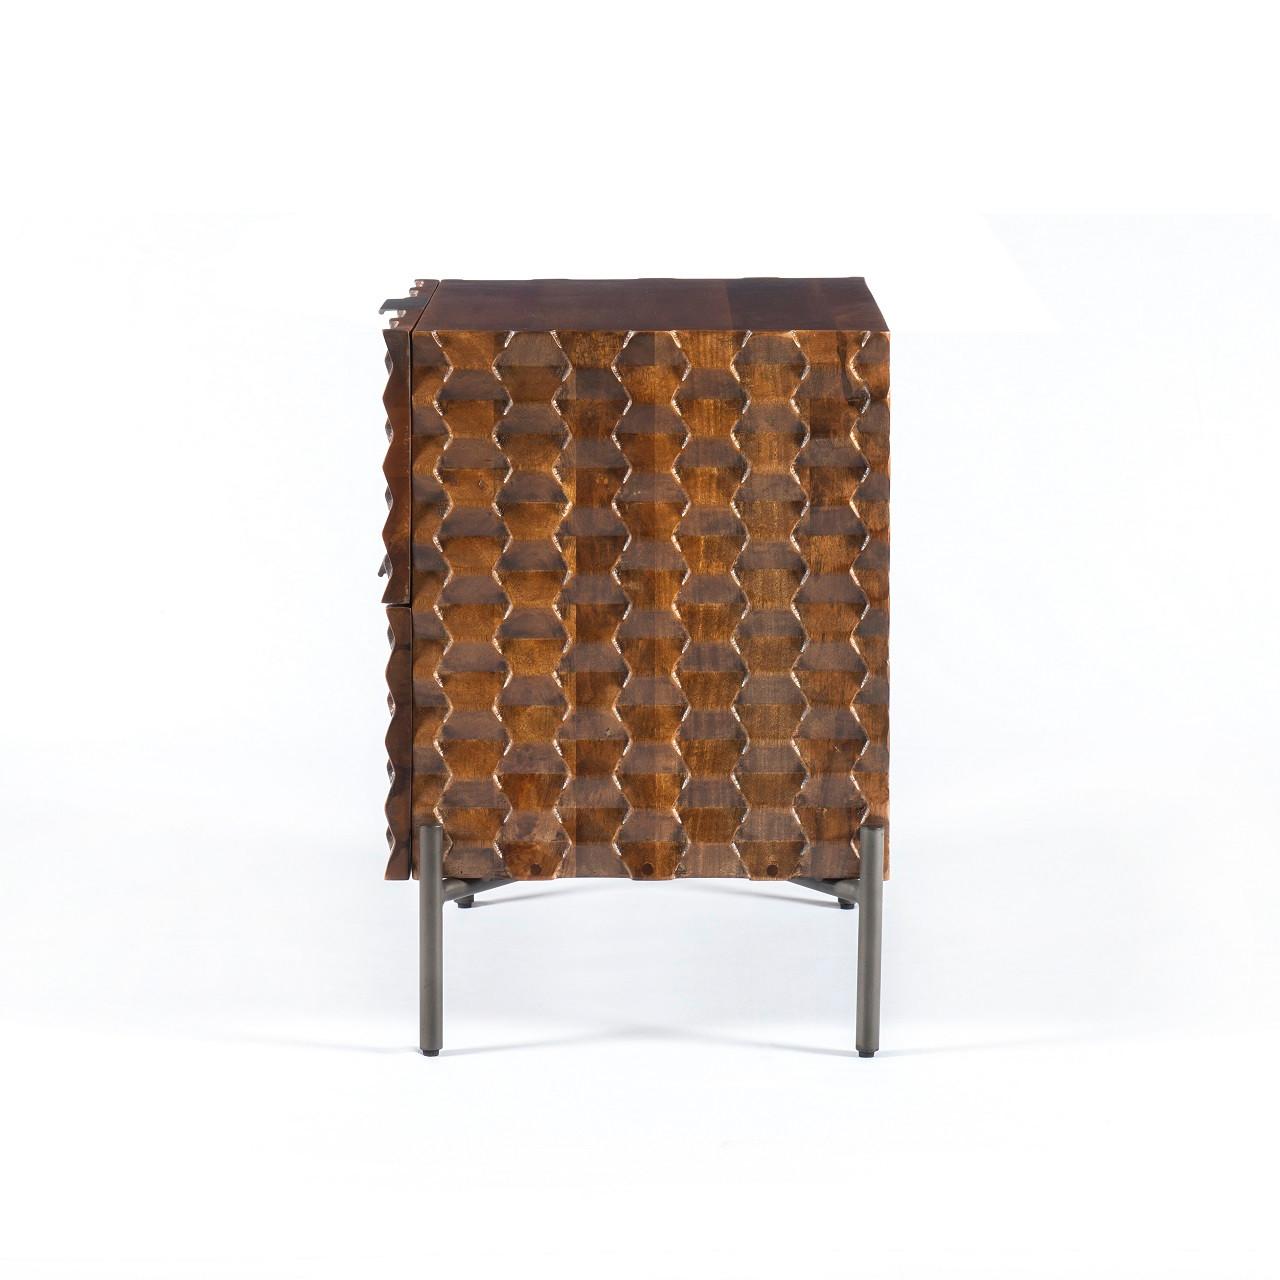 Raffael Nightstand - Carved Antique Brown